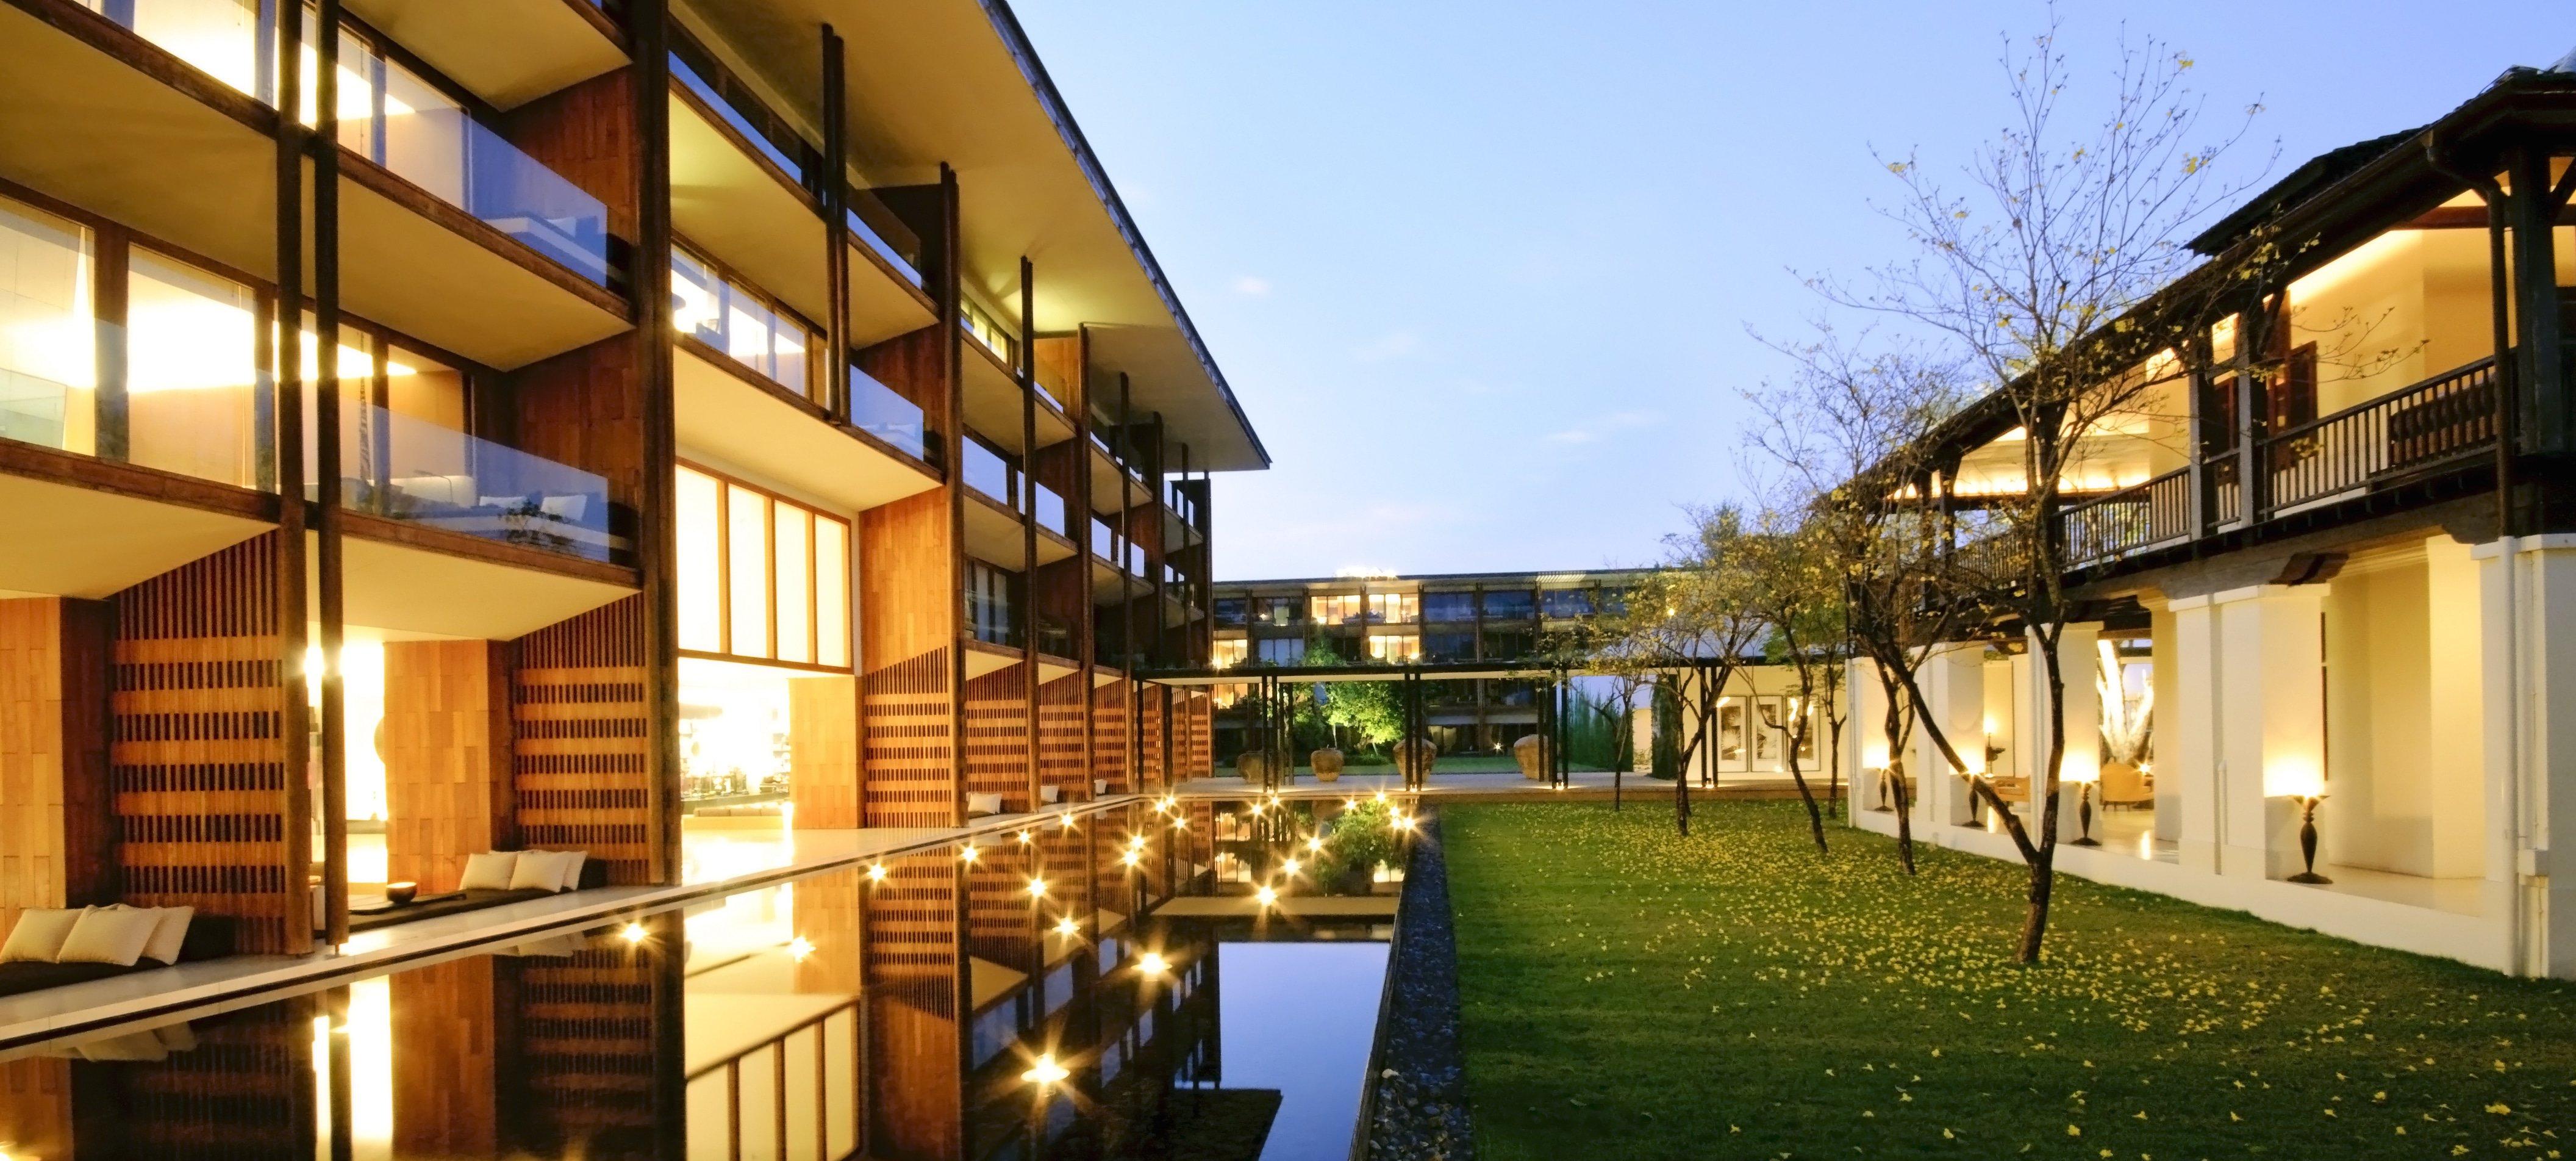 LED belysning utomhus